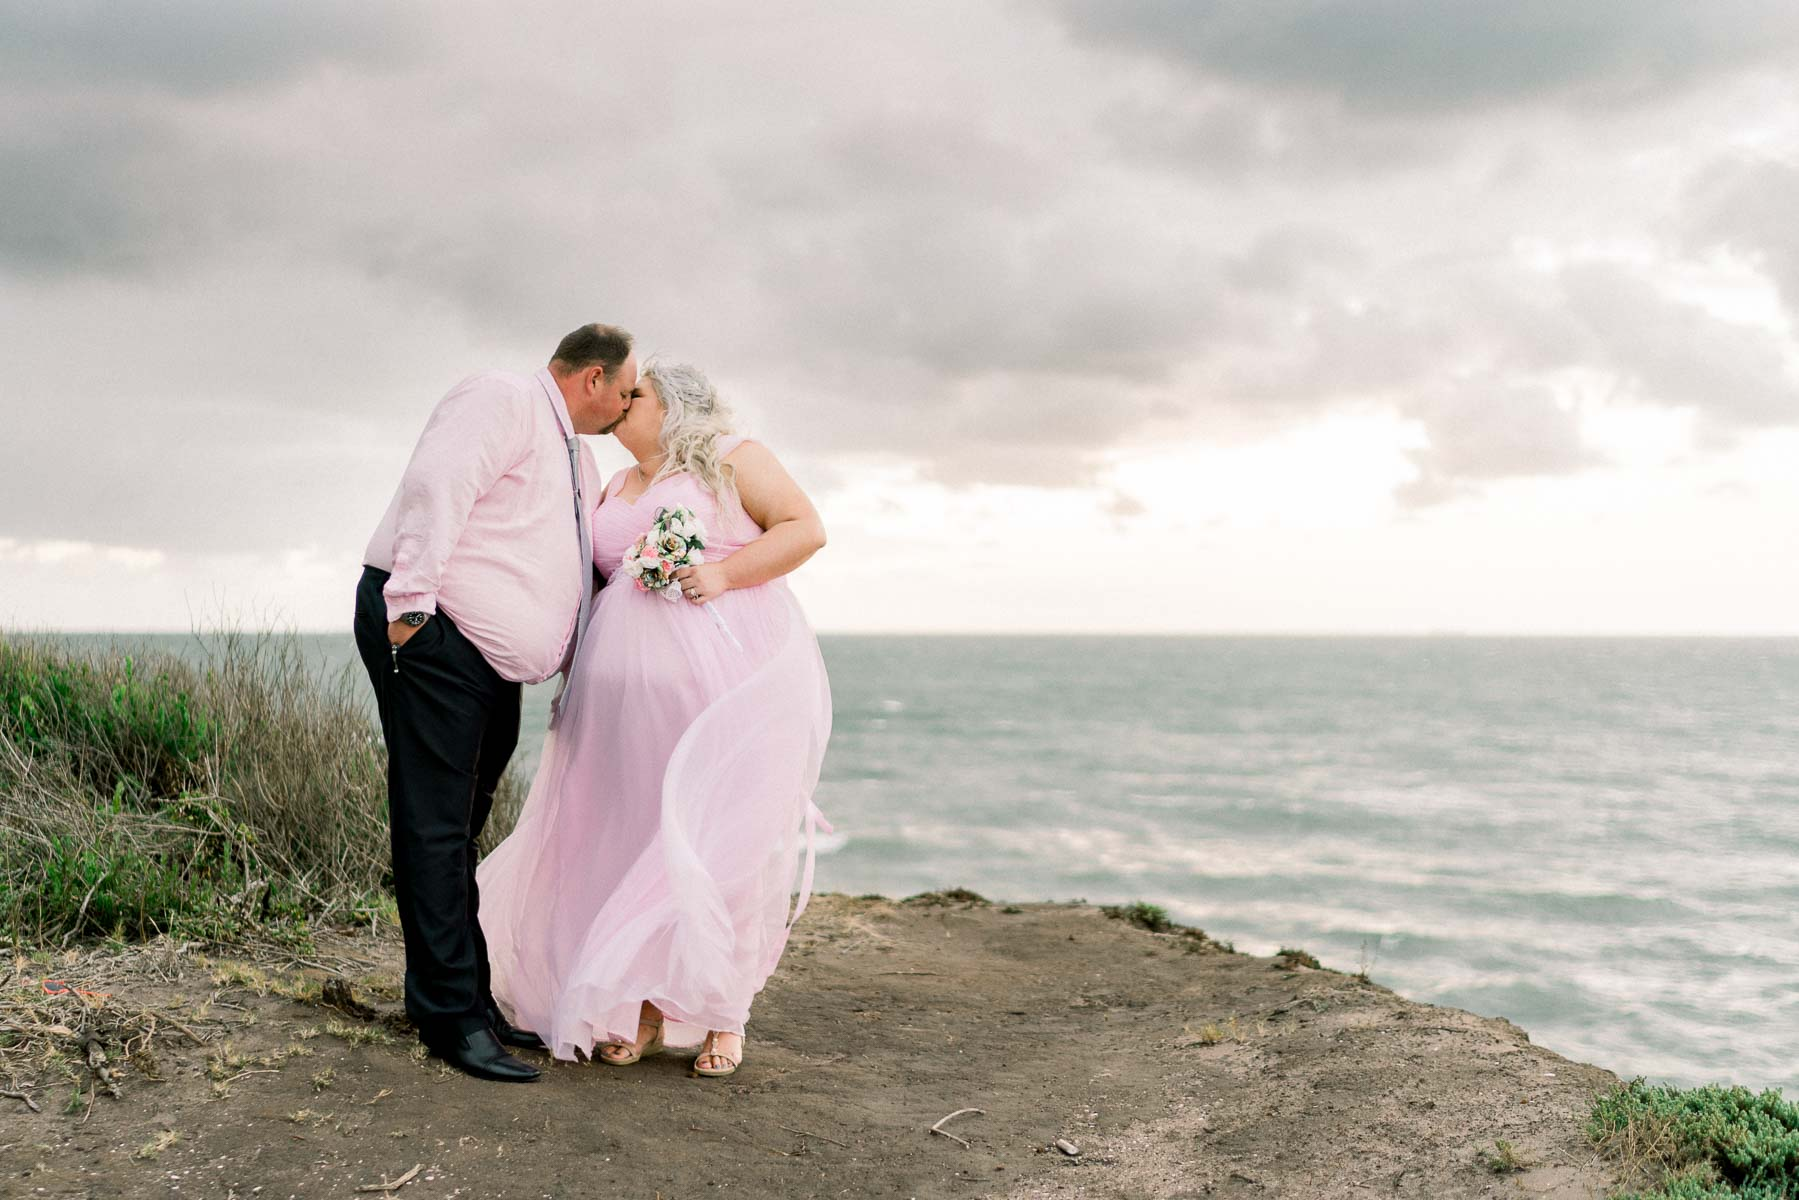 mt-eliza-mornington-peninsula-backyard-wedding-heart+soul-weddings-allison-matt-04170.jpg